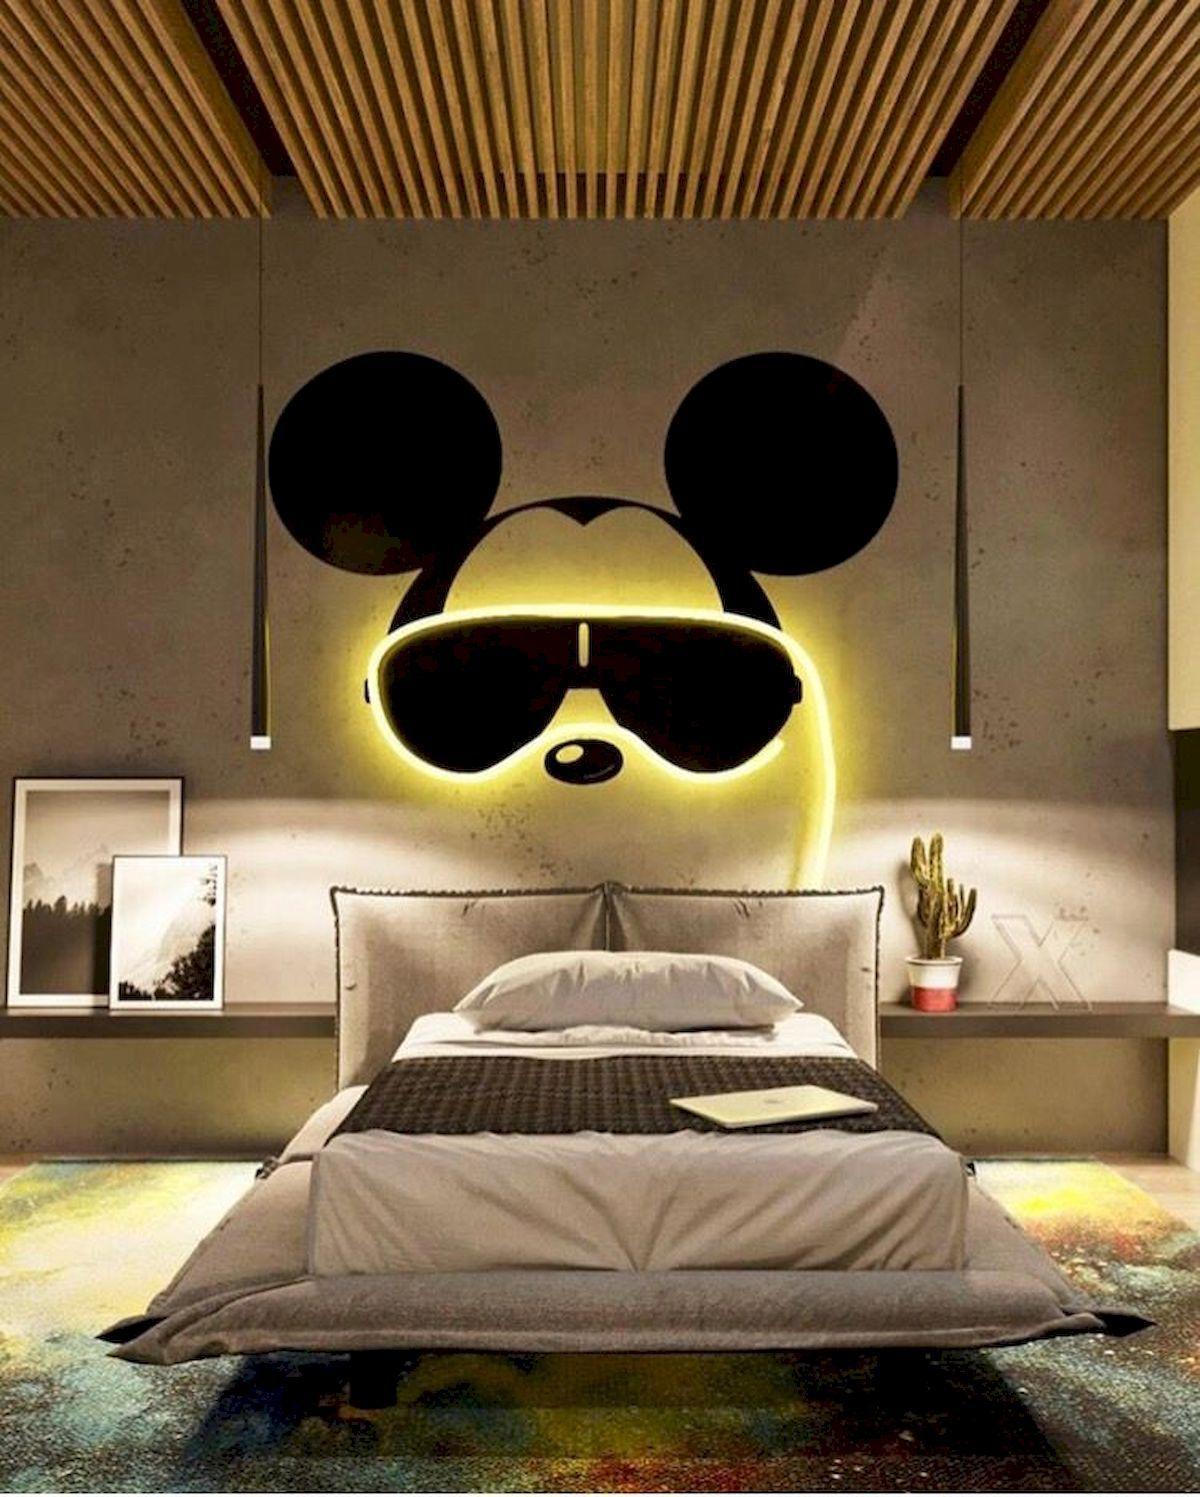 Modern Lighting Ideas The Ideal Light For A Children Room: 45 Best Bedroom Lights Create A Romantic Atmosphere